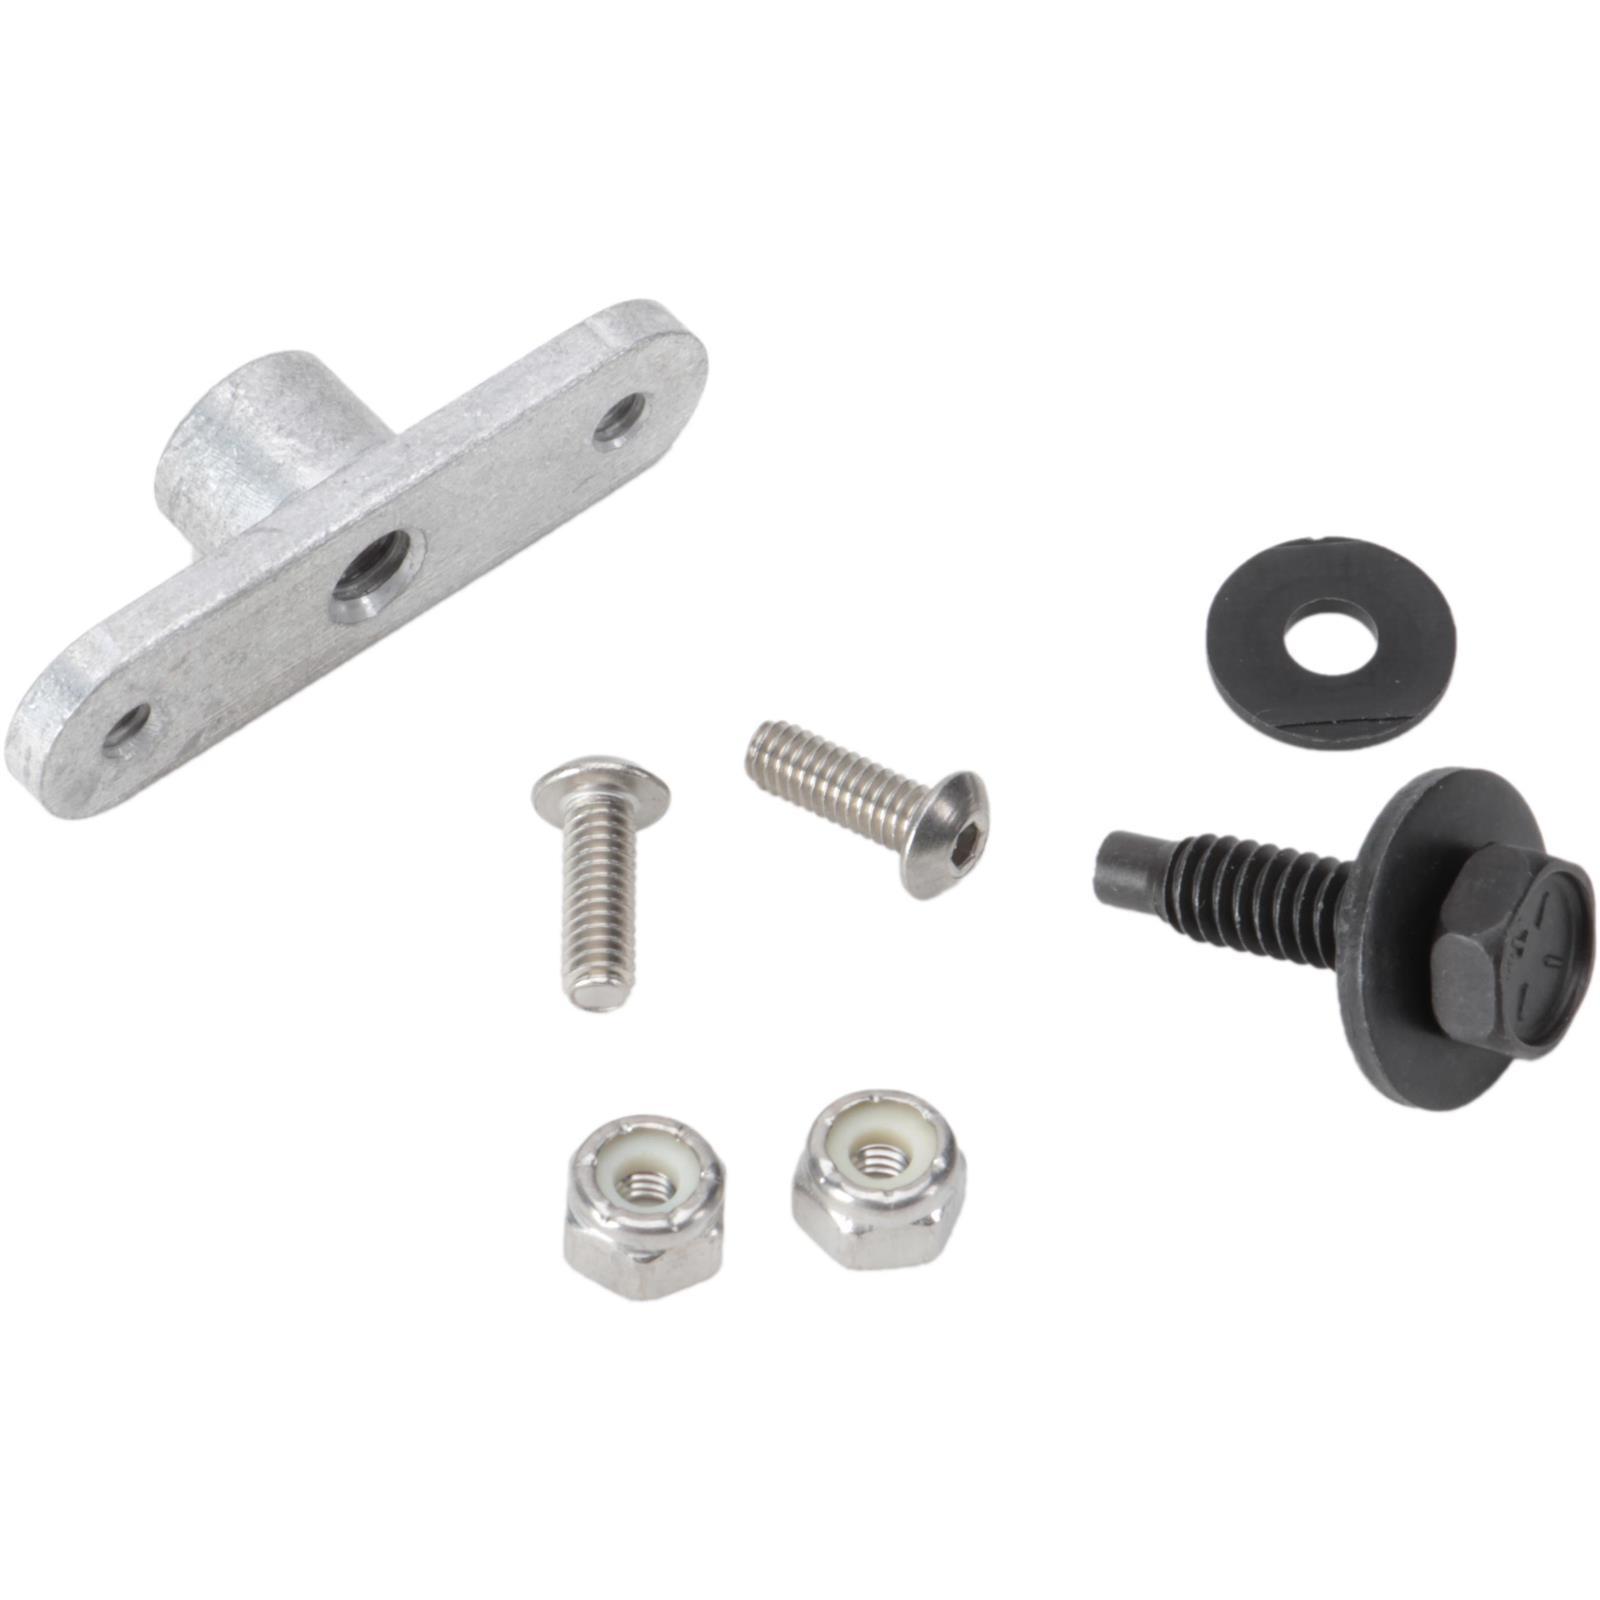 1-1//4 Long 5//16-18 Coarse Tru-Lite Titanium Beadlock Bolt